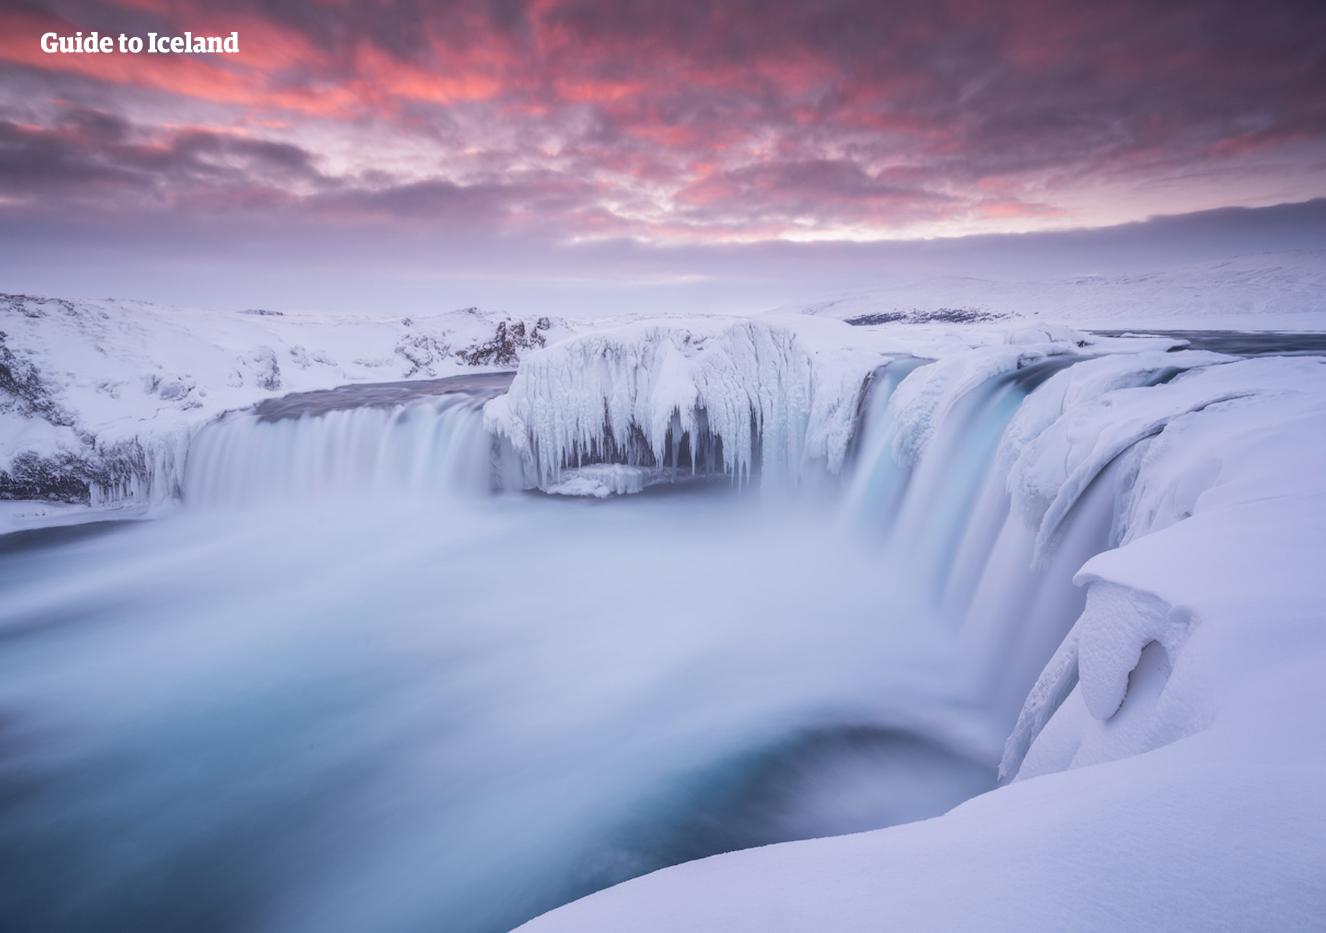 Wodospad Goðafoss, północna Islandia, zimą skuty lodem i śniegiem.